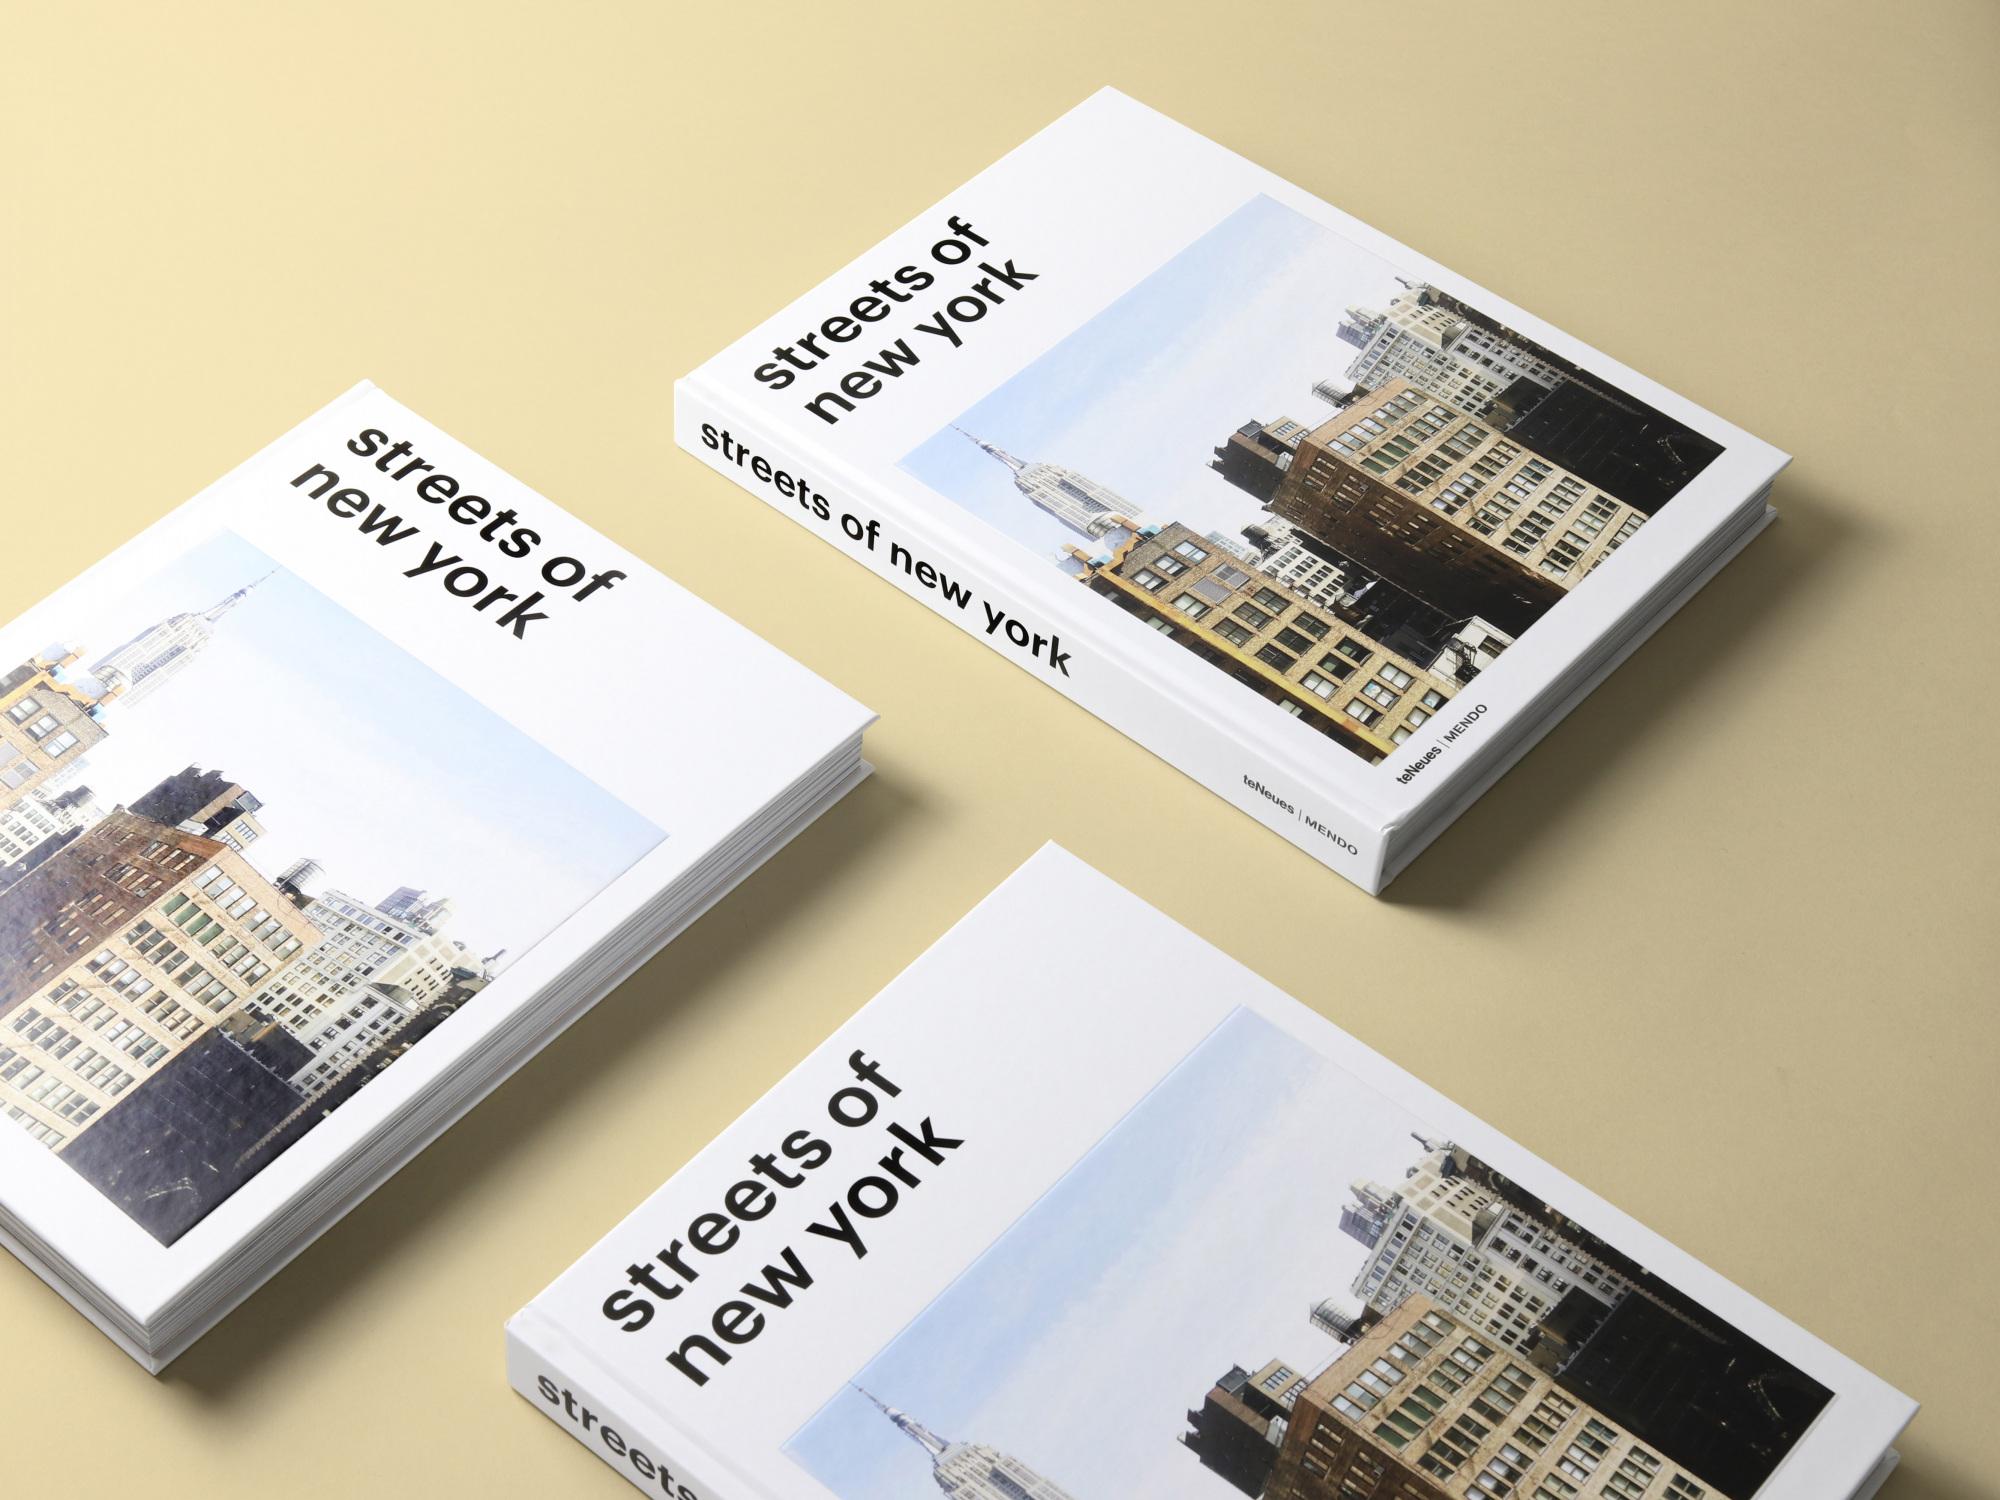 mendo-book-streets-of-new-york-05-2000x1500-c-default.jpg